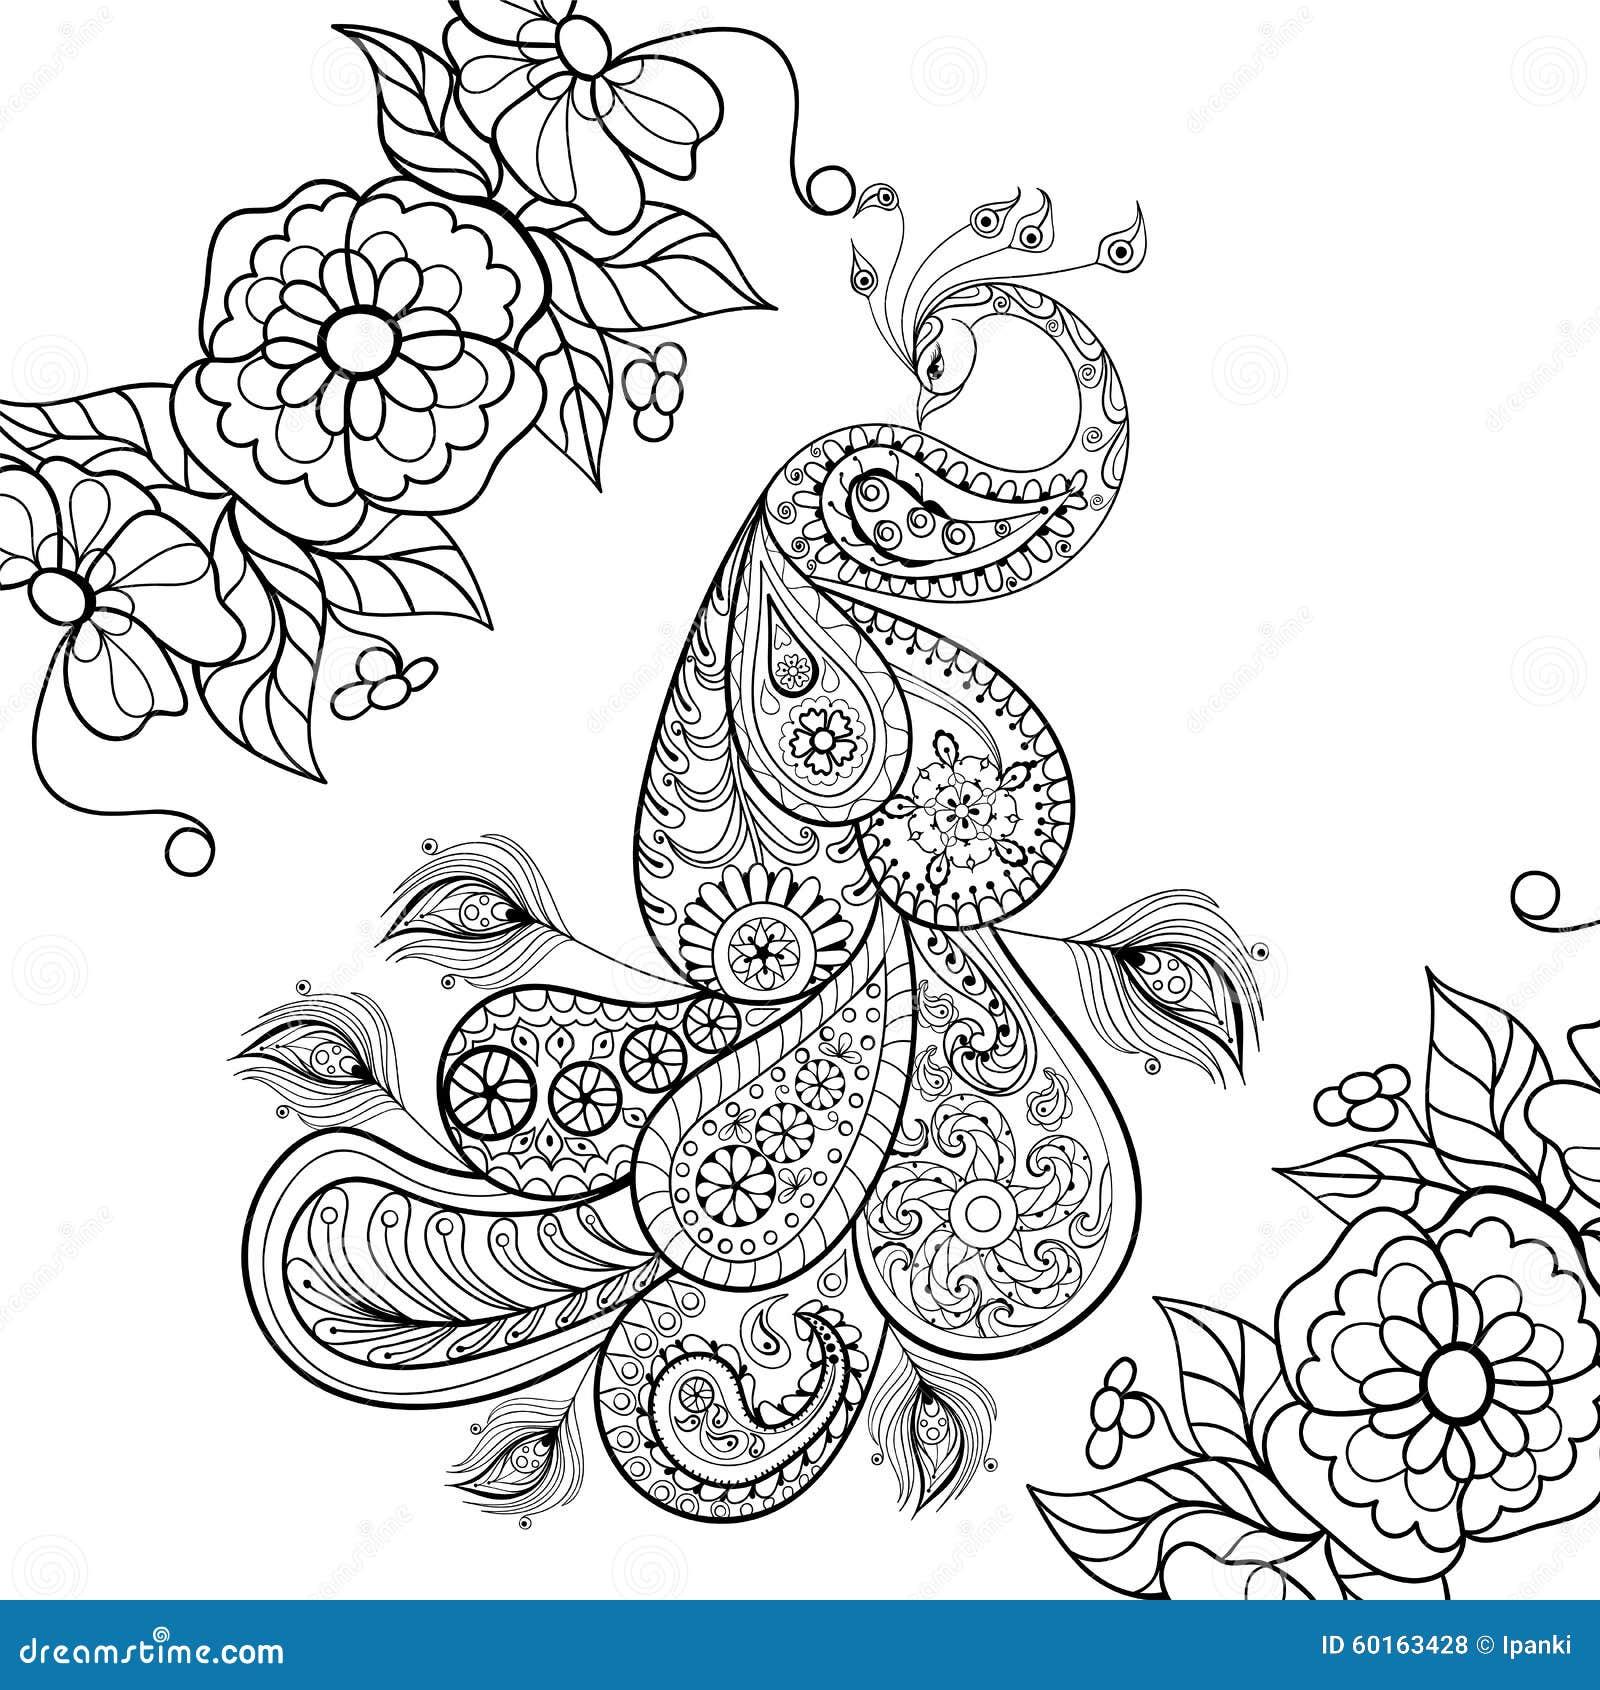 Mandala Kleurplaten Pauw.Kleurplaat Van Mandala Pauw Mandala Ausmalbilder Fr Erwachsene